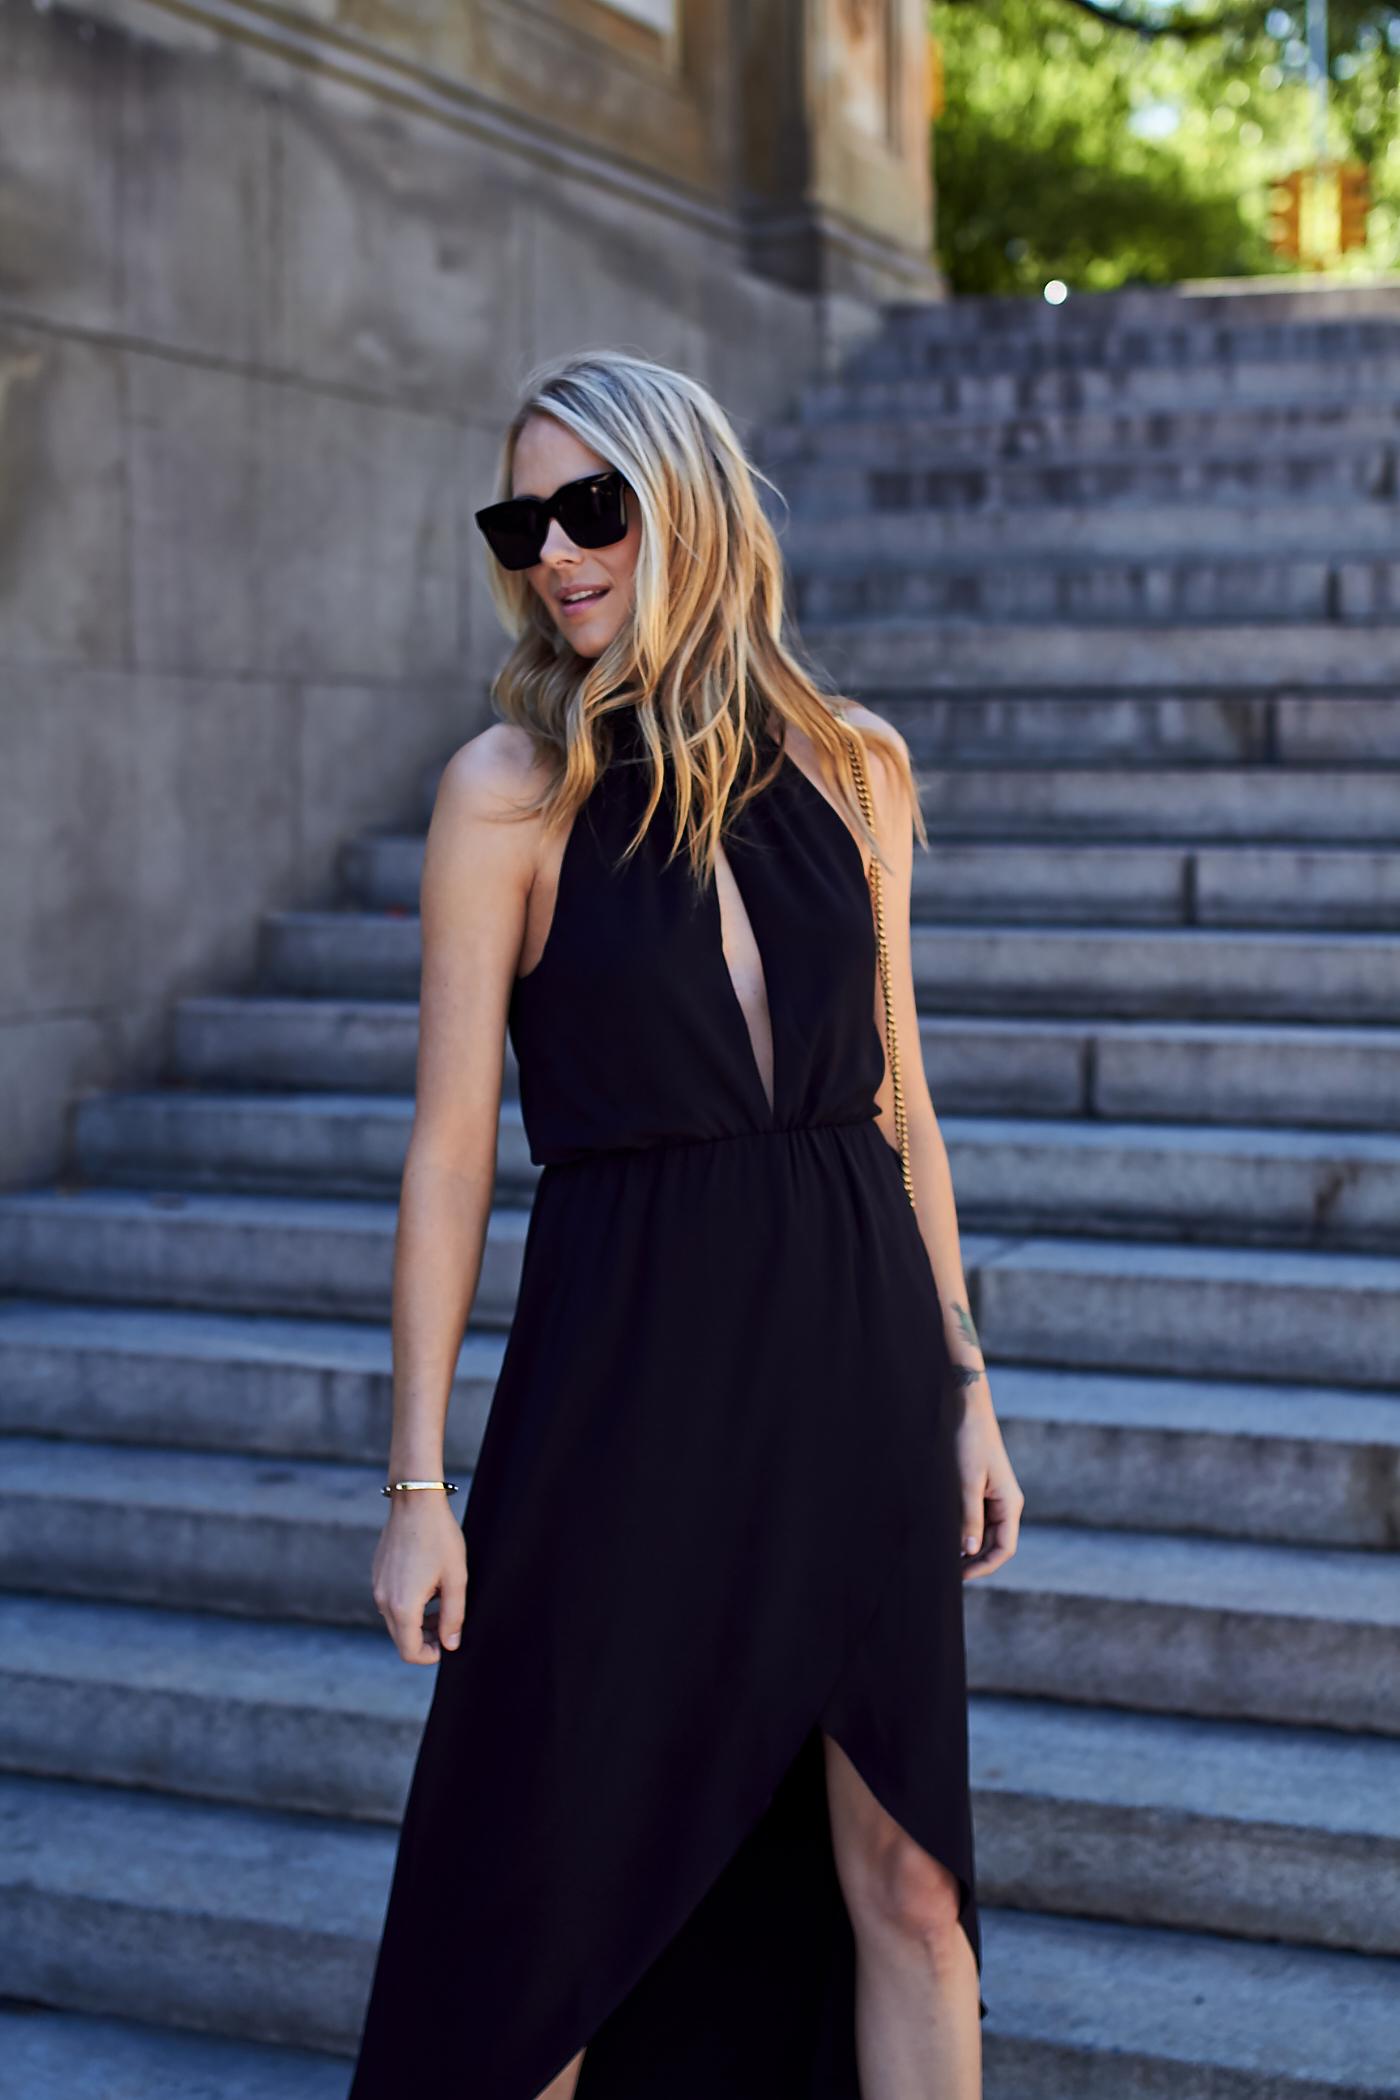 fashion-jackson-black-celine-sunglasses-black-high-low-hem-dress